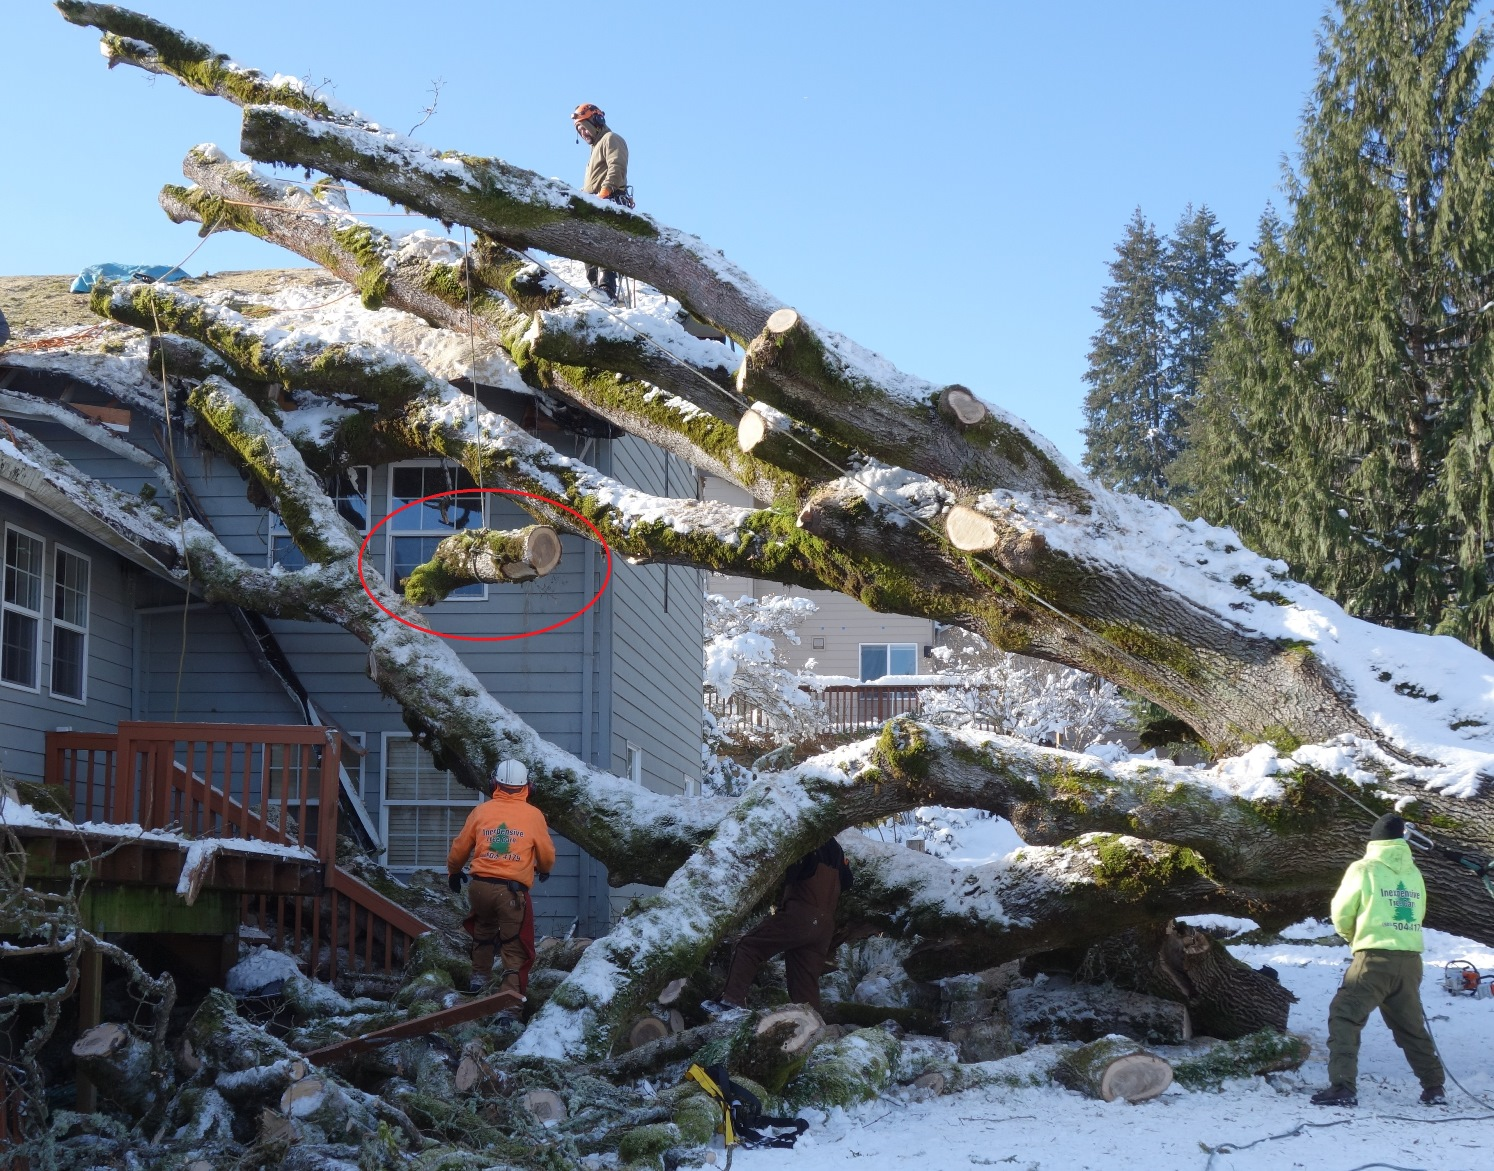 Lowering the log